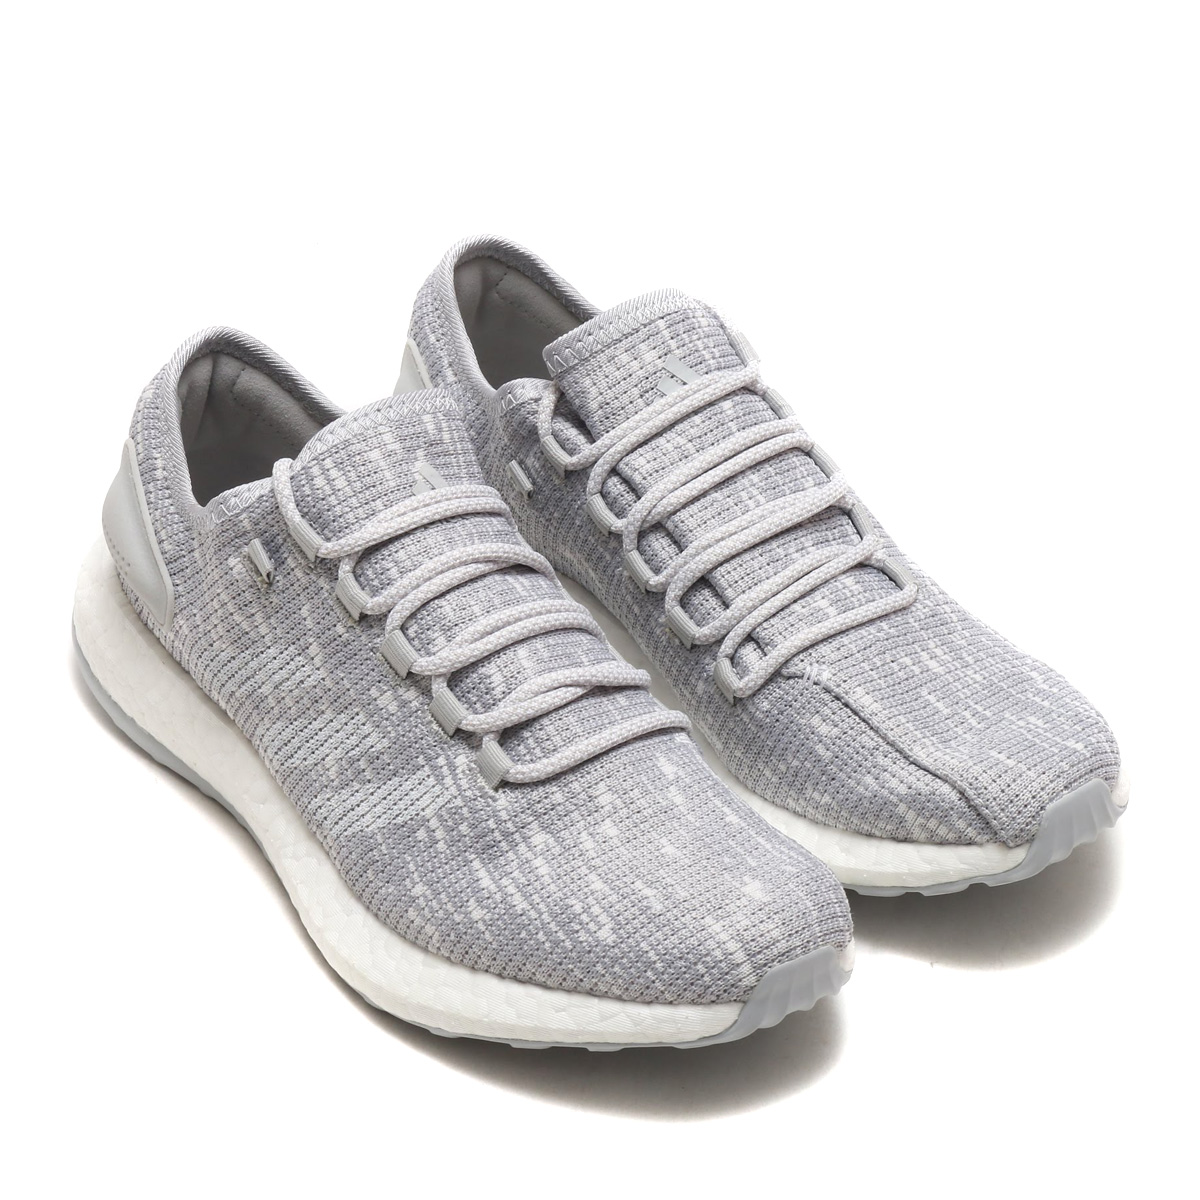 adidas Originals PureBOOST LTD(アディダス オリジナルス ピュアブースト LTD)(ランニングホワイト/ランニングホワイト/ブルー)18SS-I